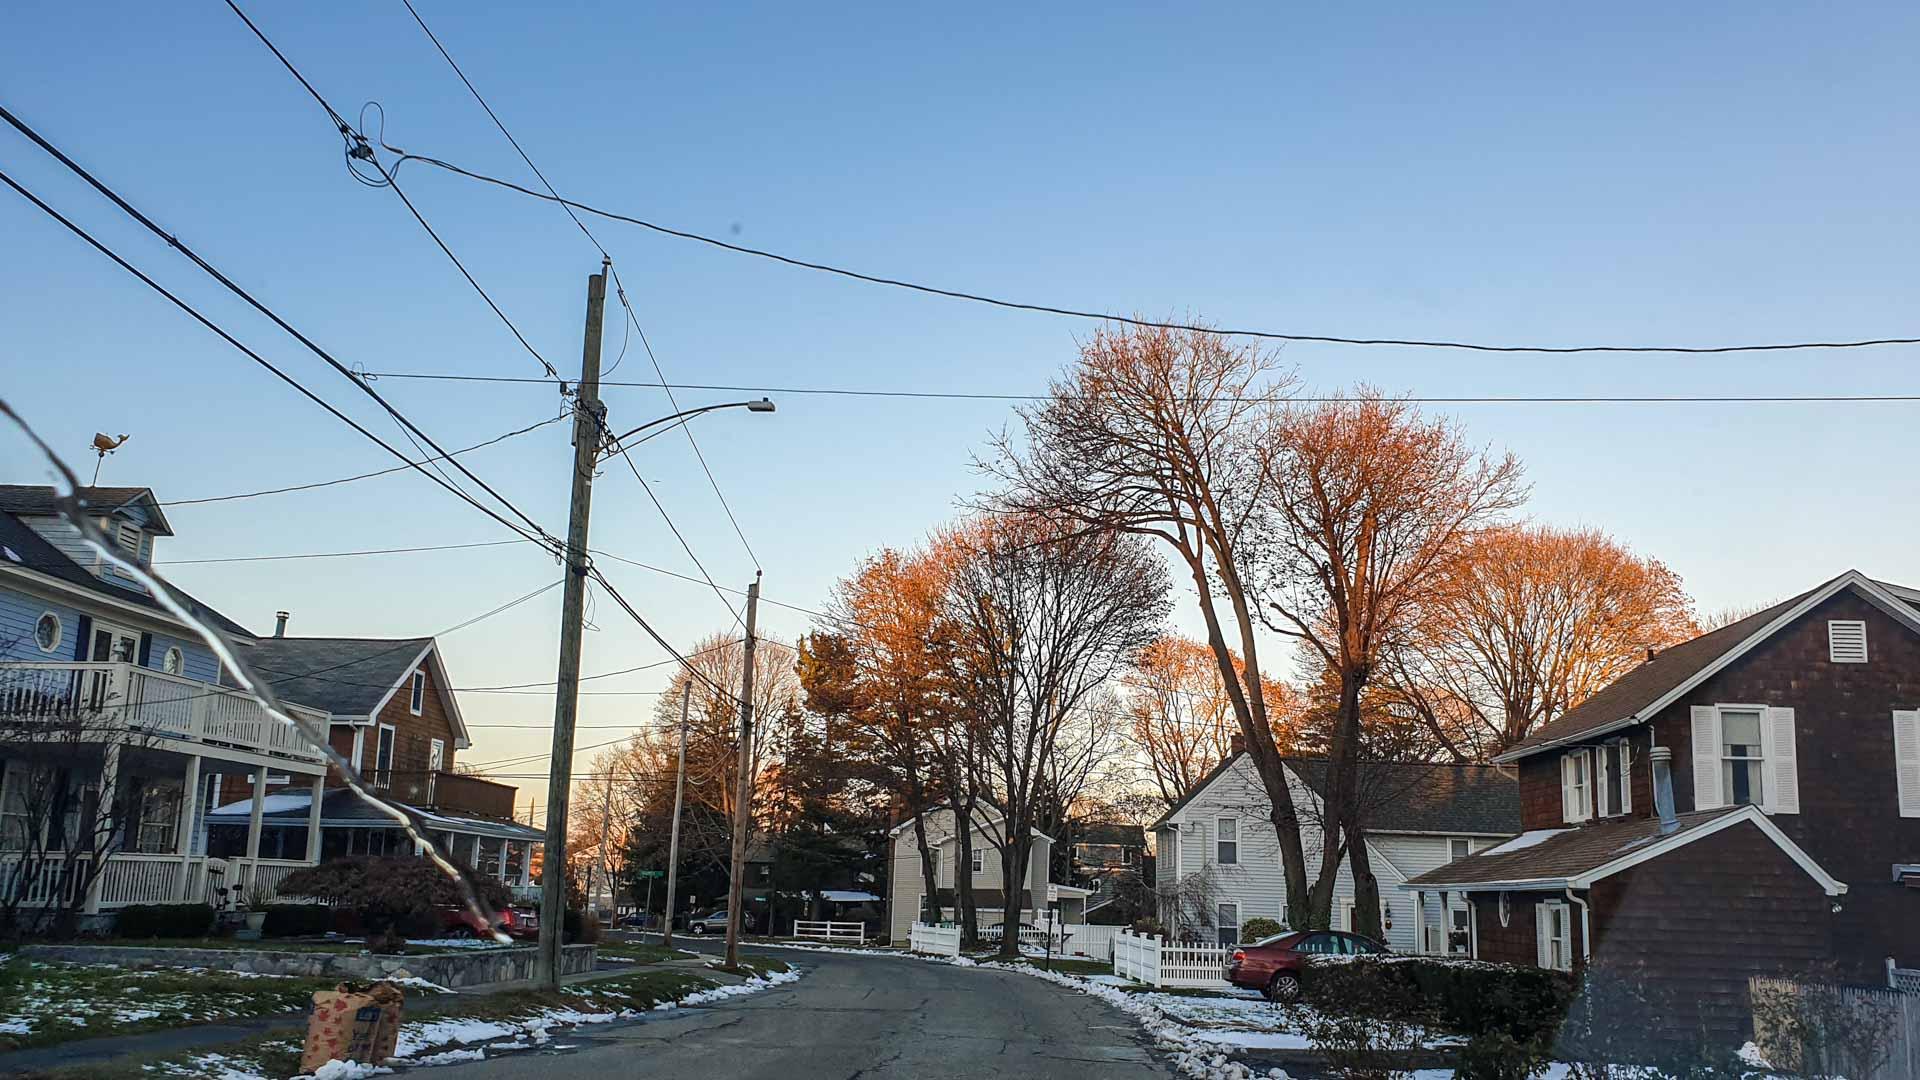 via da un quartiere residenziale a Milford, Connecticut